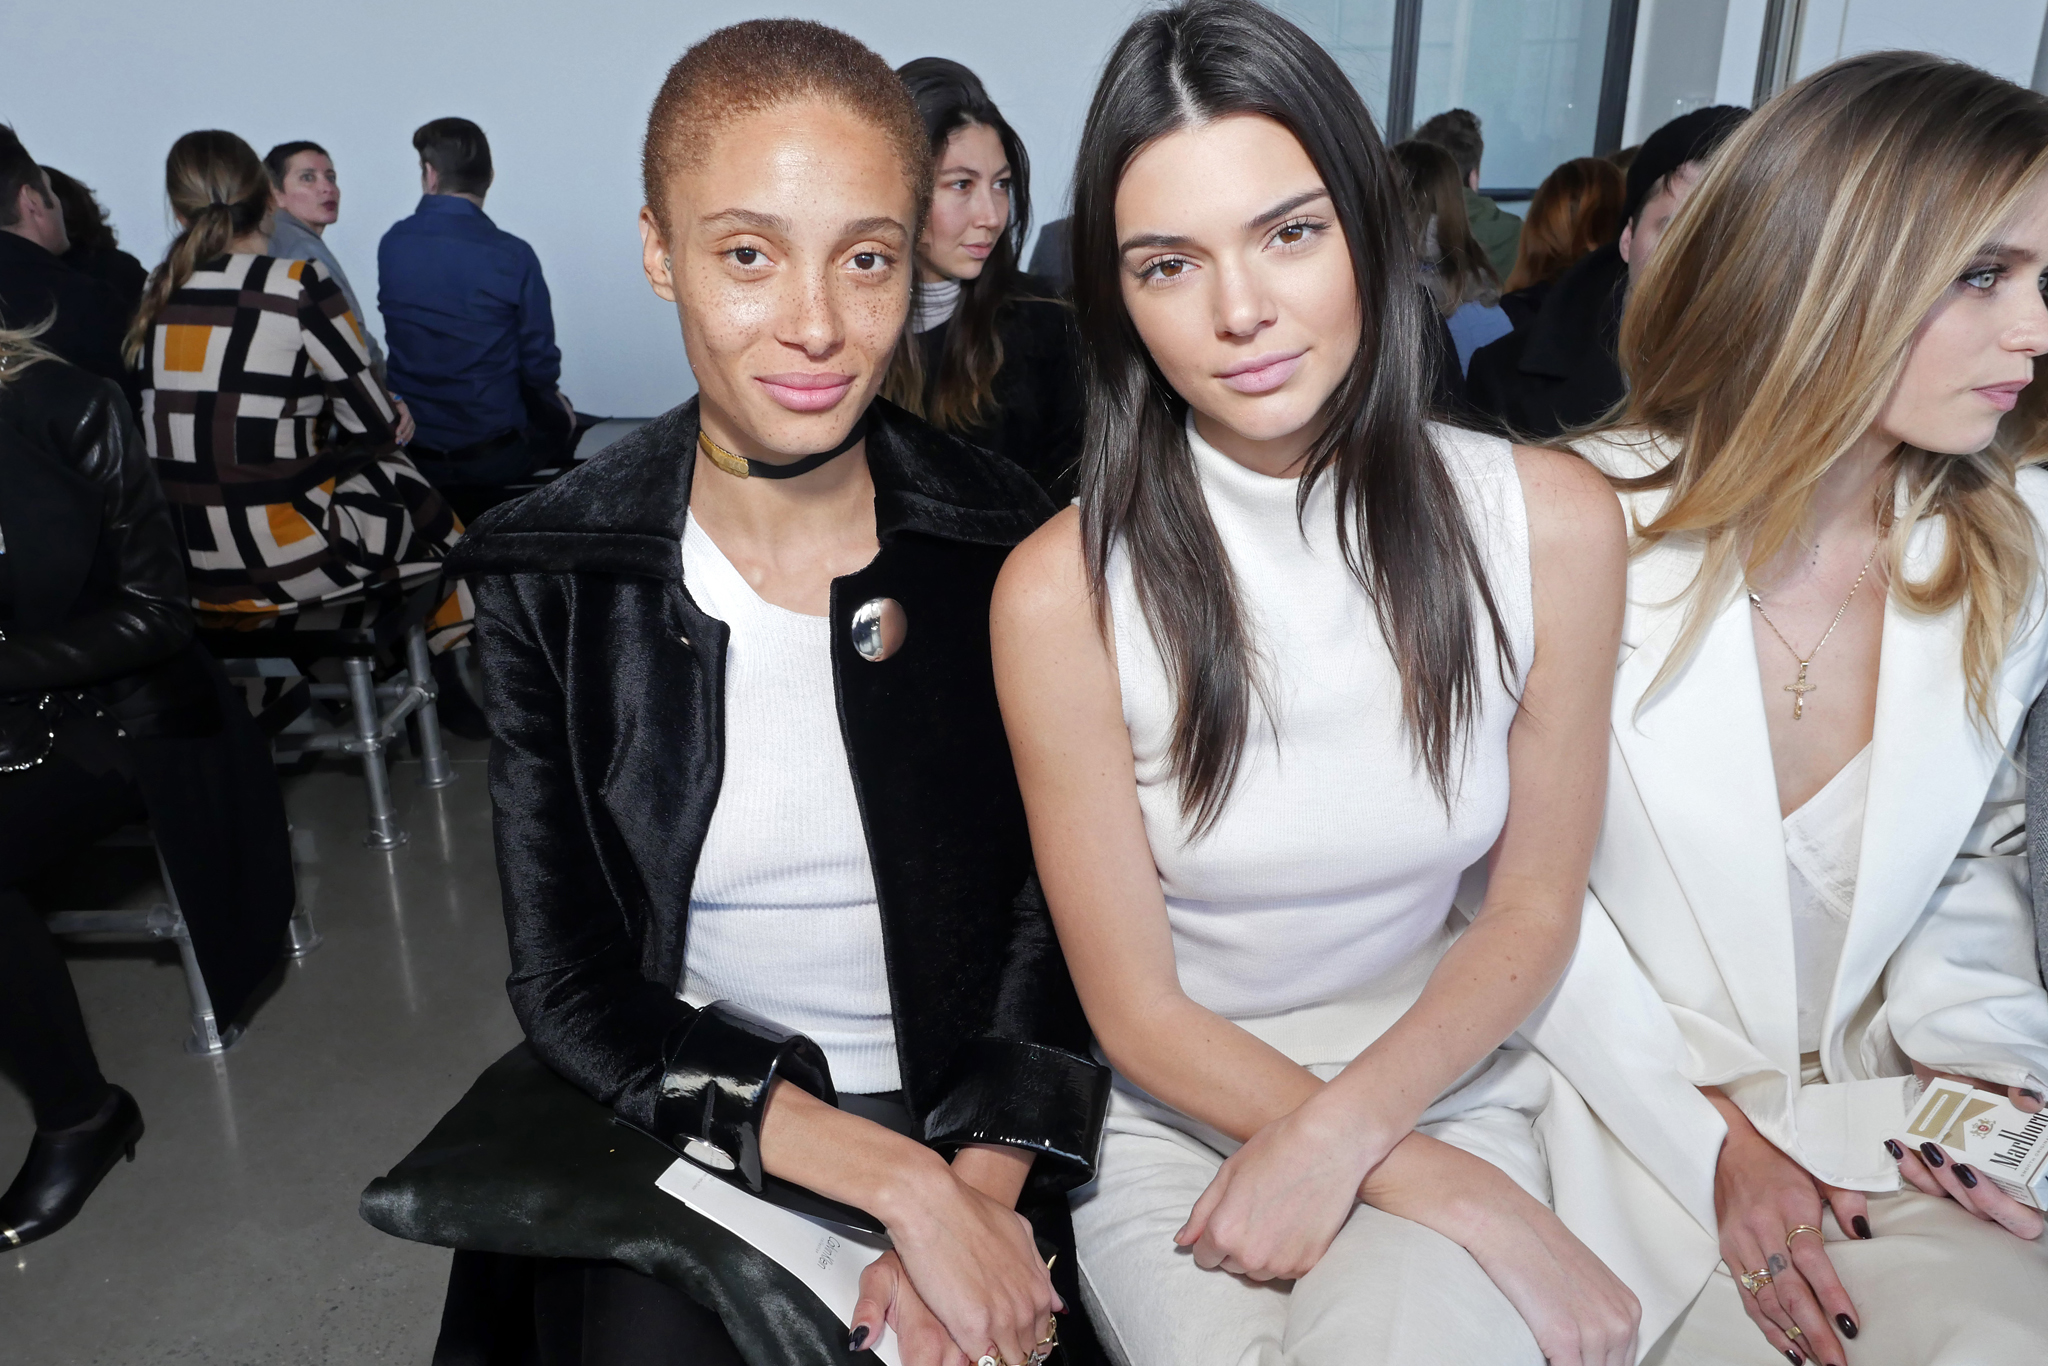 Adwoa Aboah and Kendall Jenner